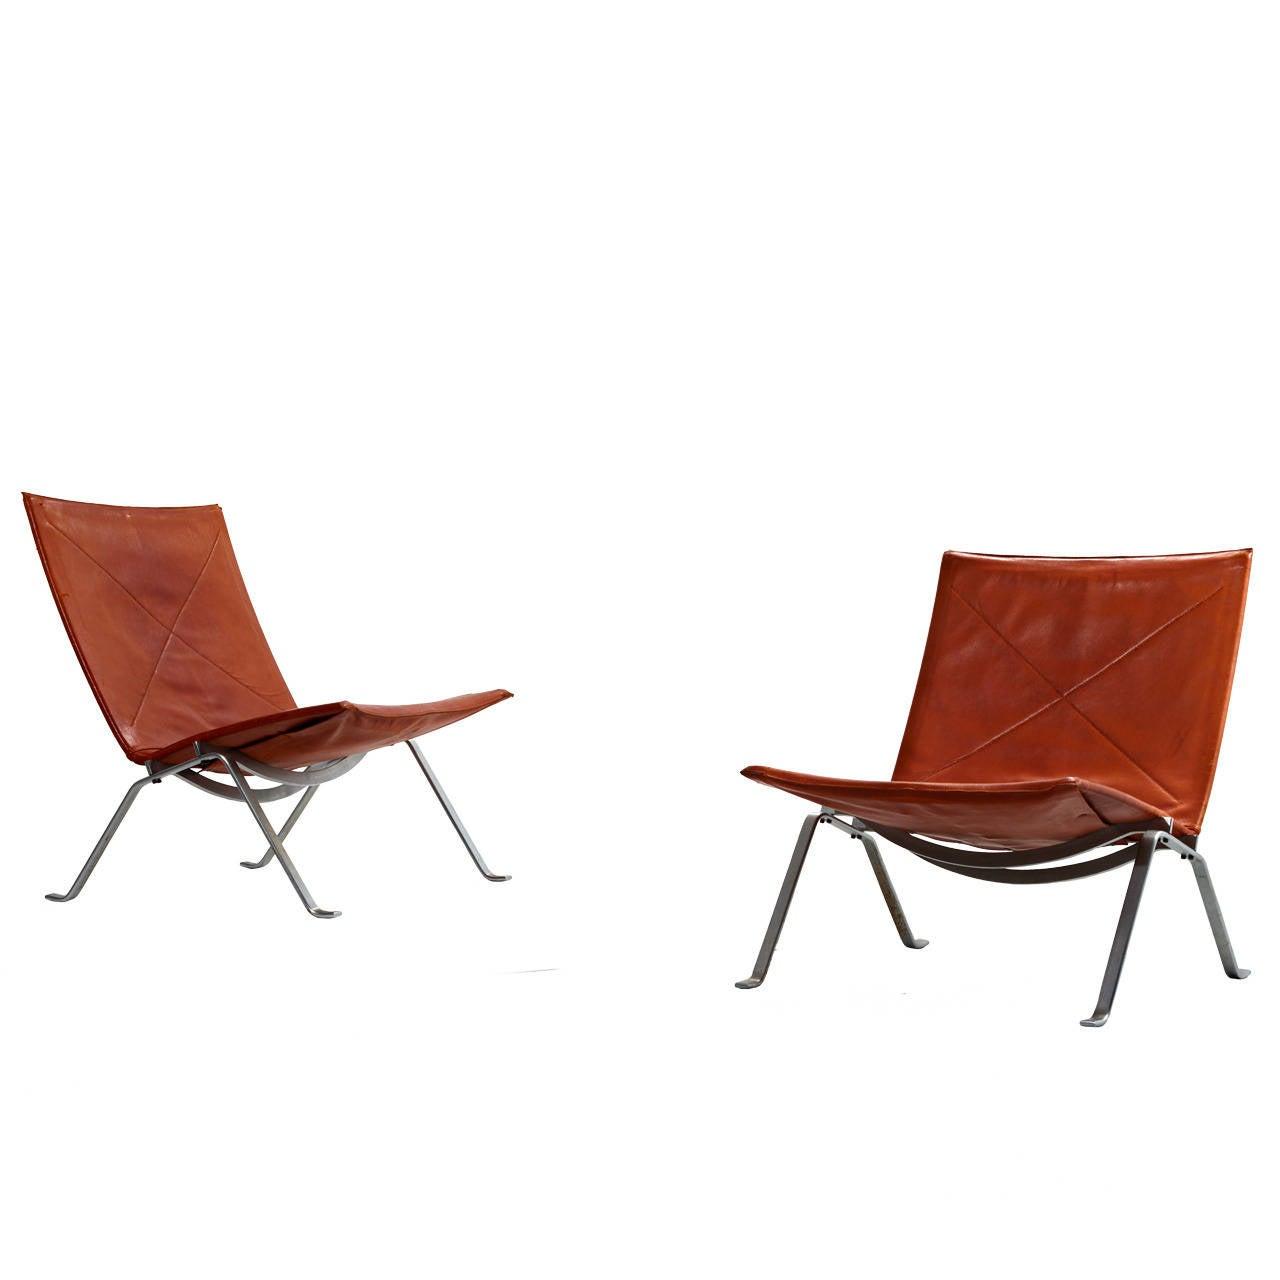 Poul Kjaerholm Pk 22 Chairs For E Kold Christensen